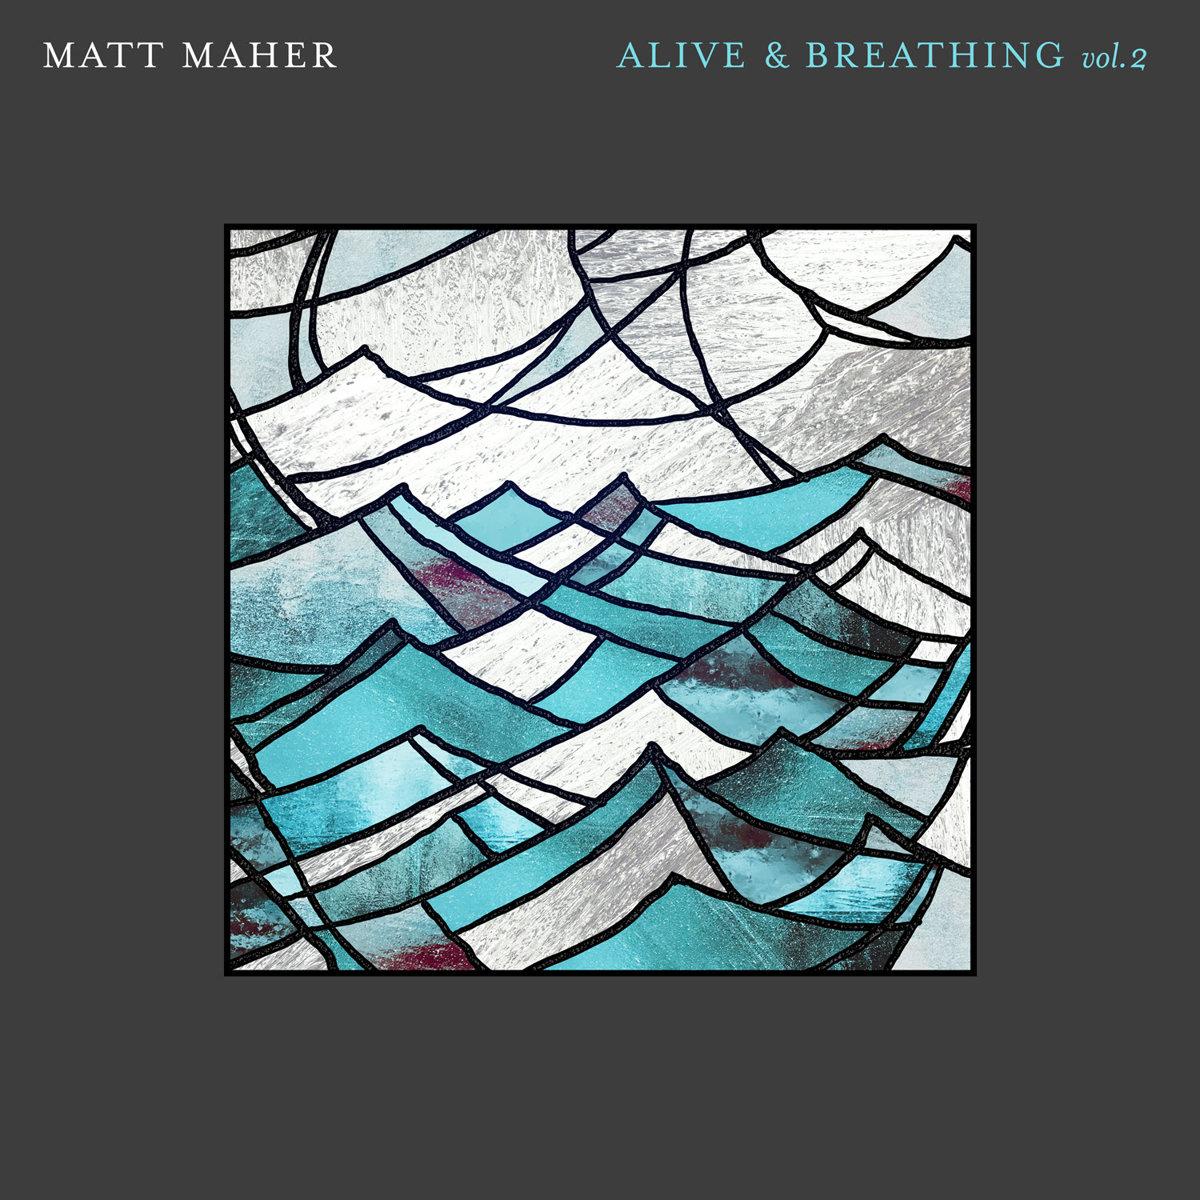 Alive & Breathing (Vol. 2)